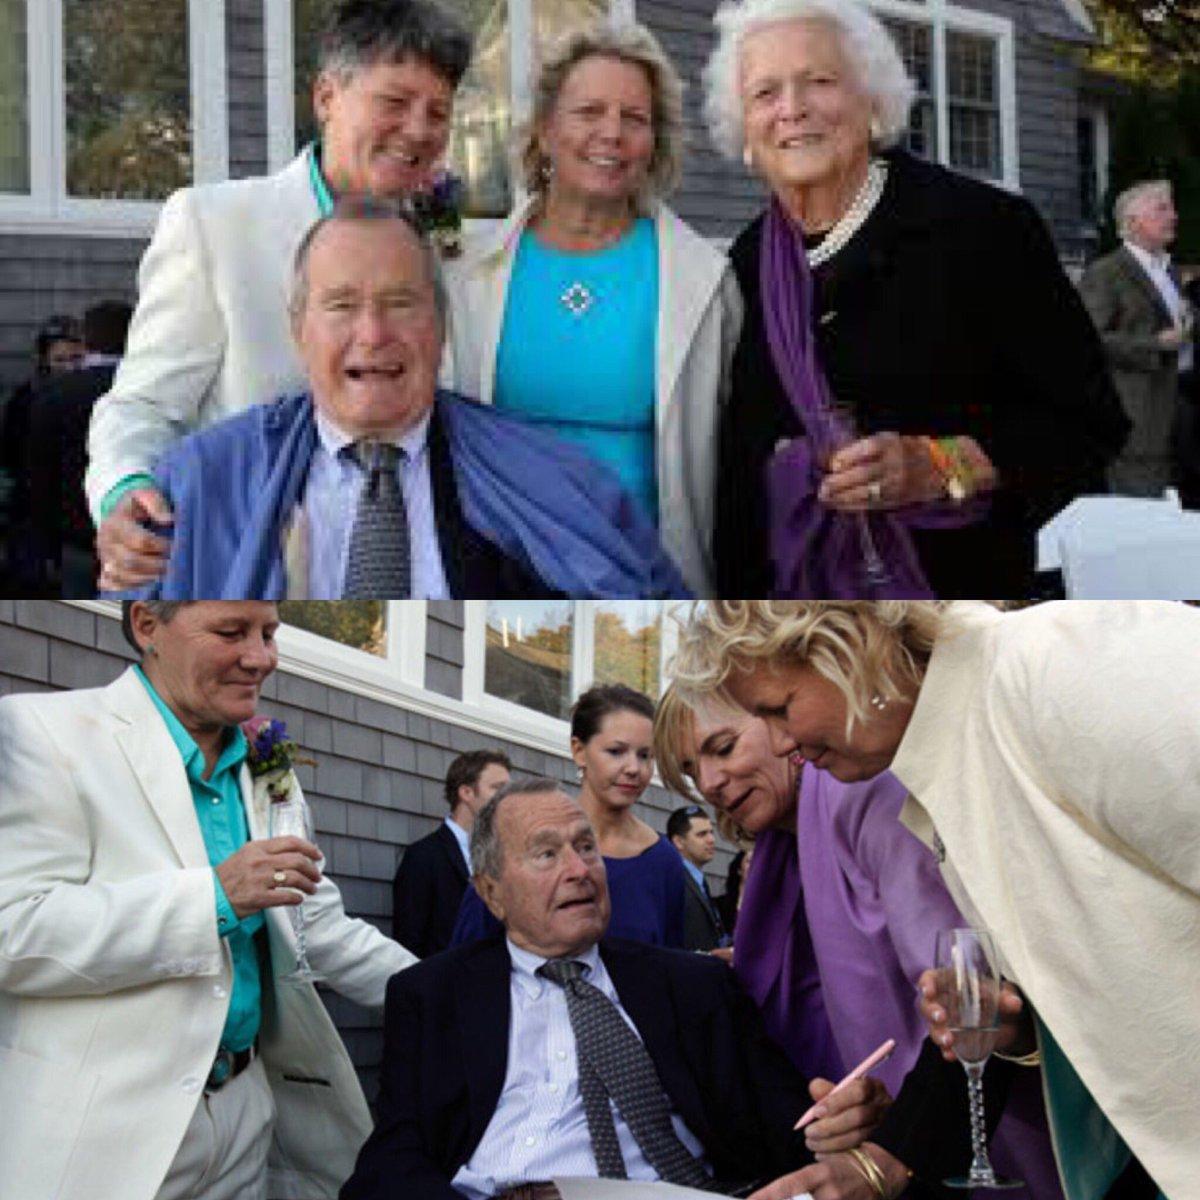 Bush marriage president same sex